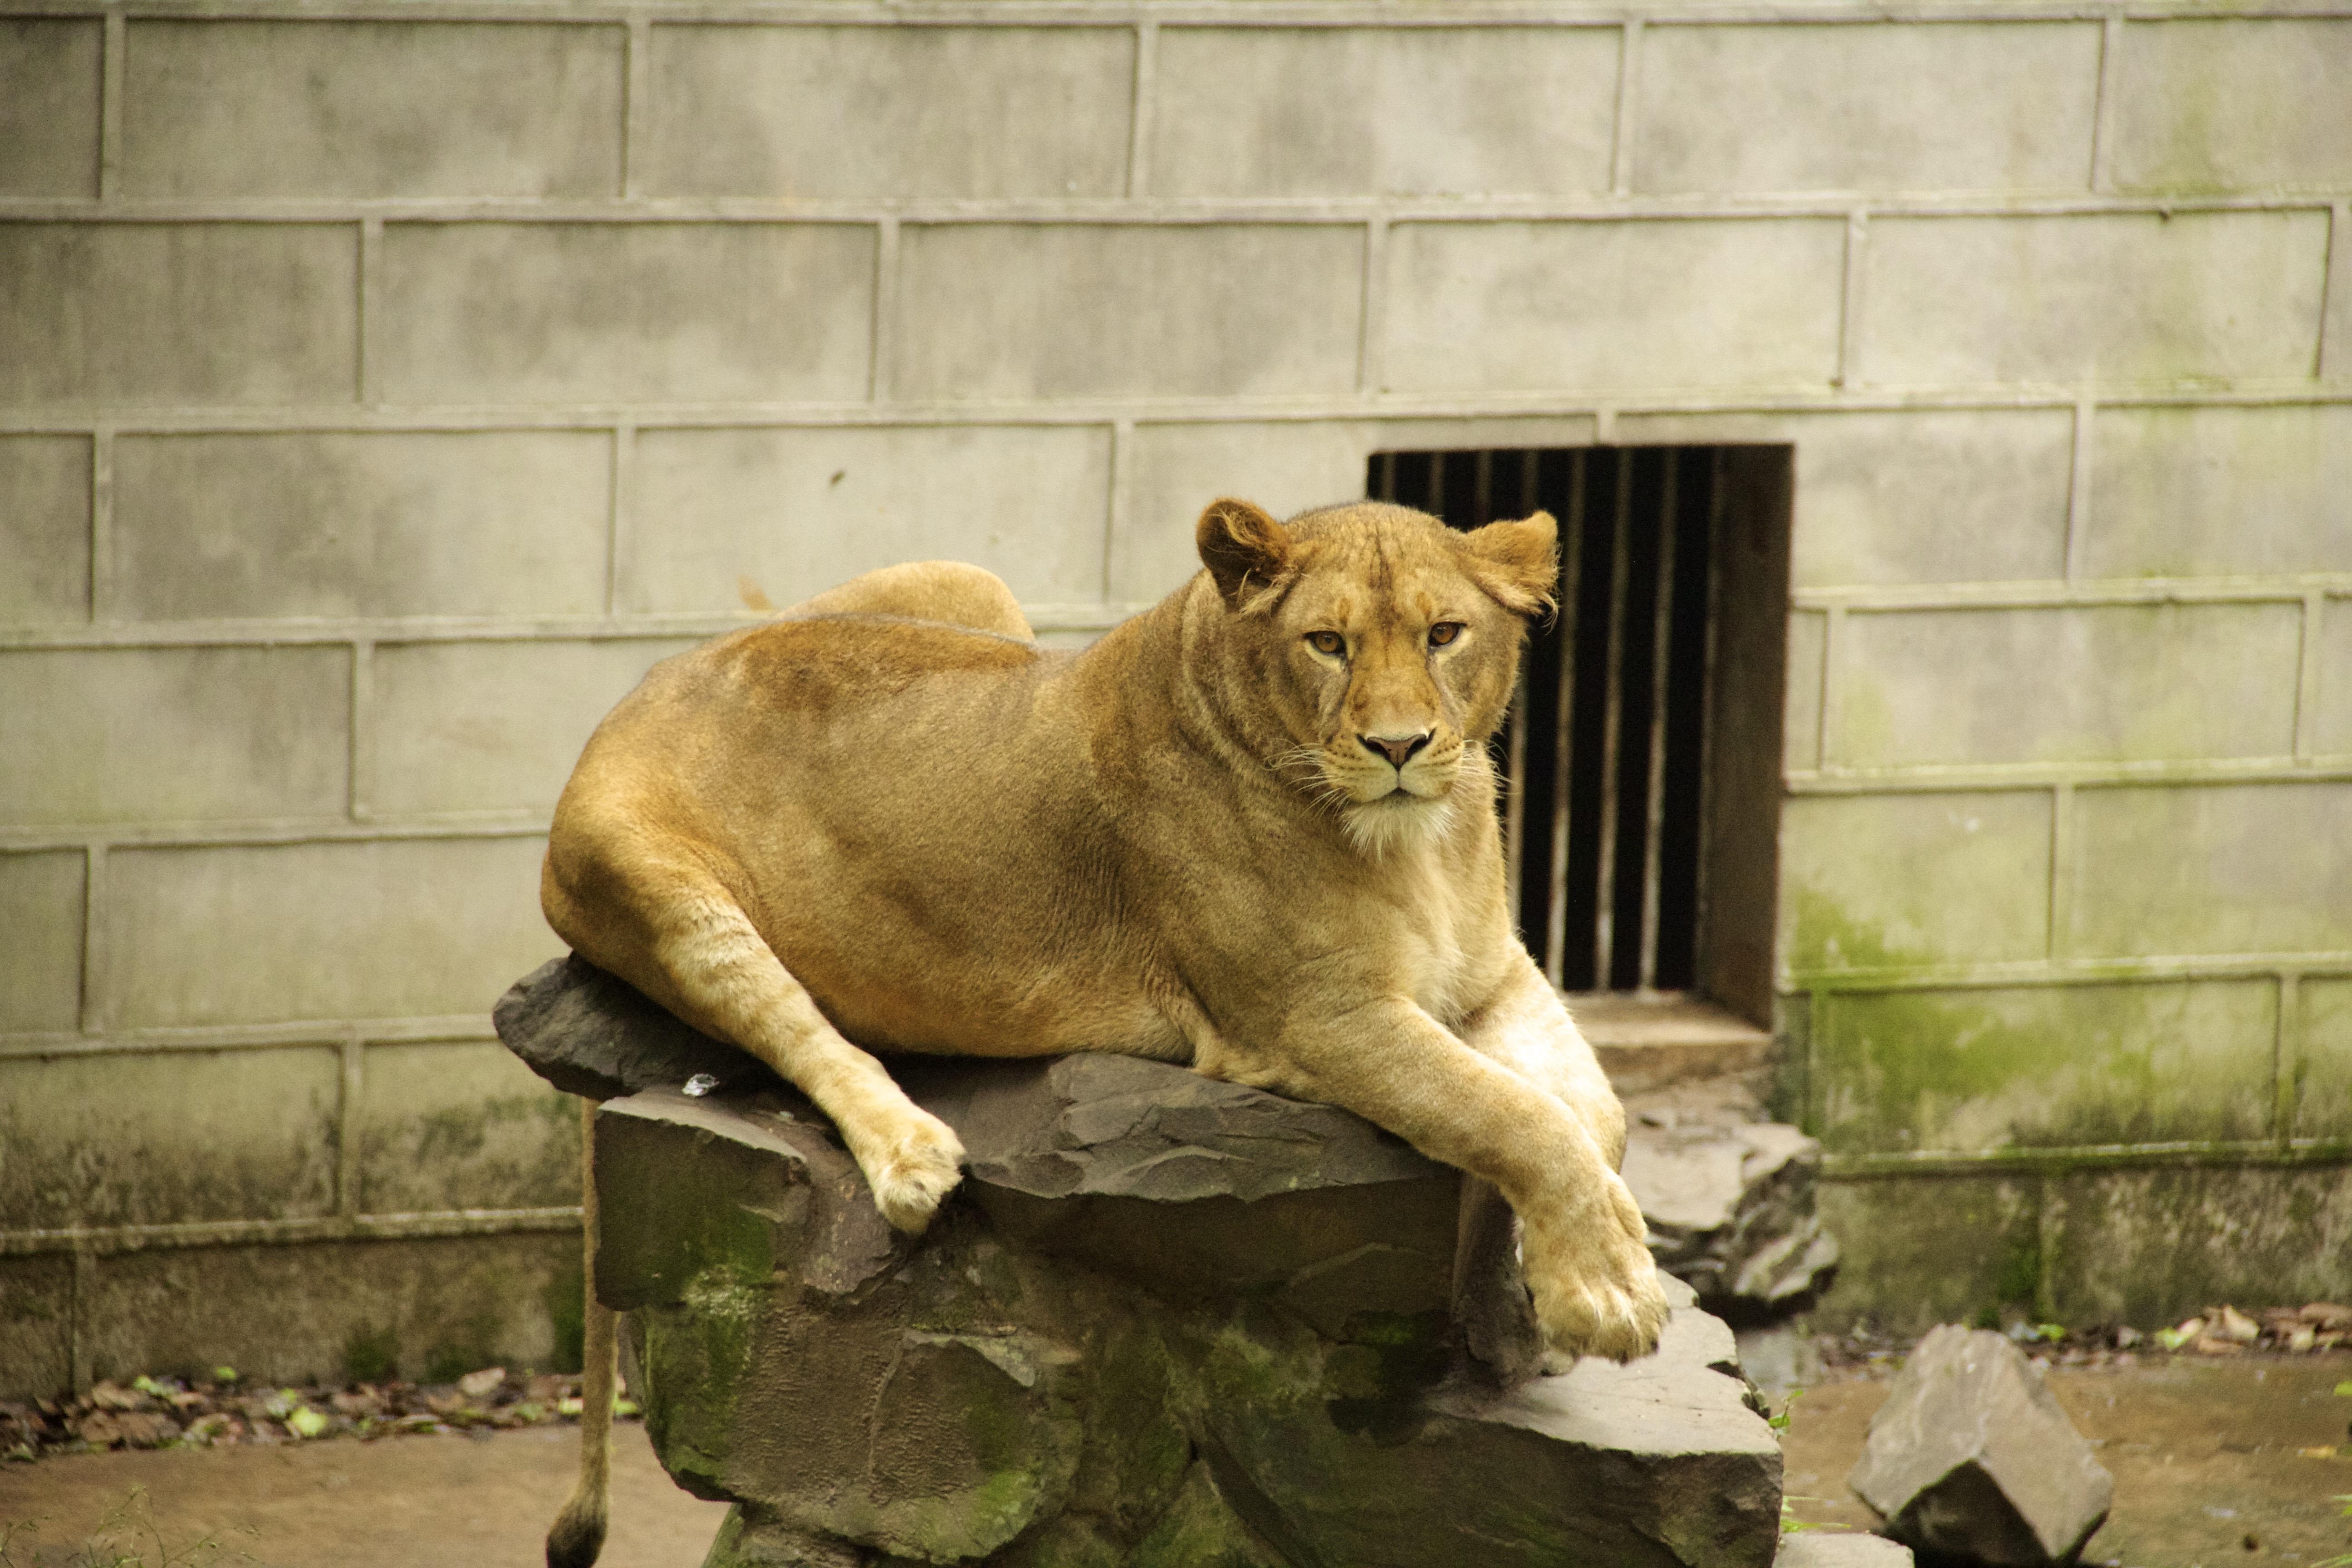 Lion@Zoo-2013-06-12